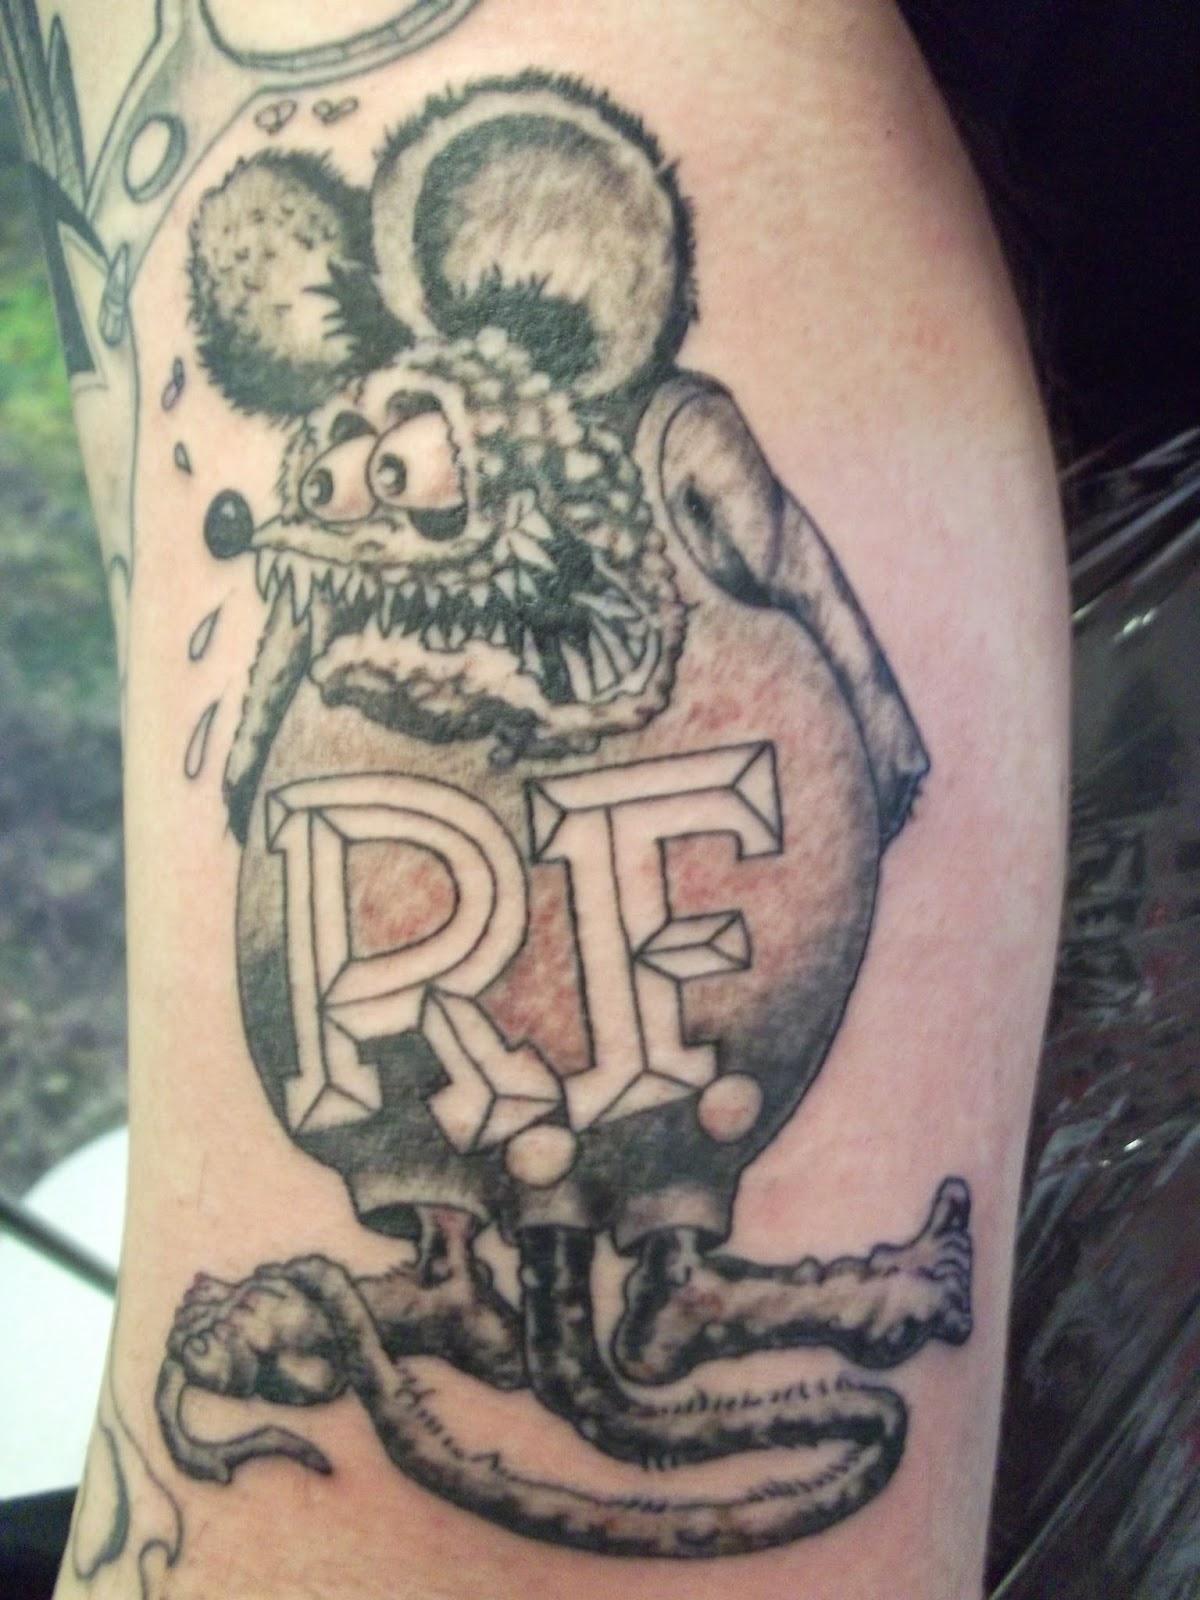 Ed Roth Tattoos